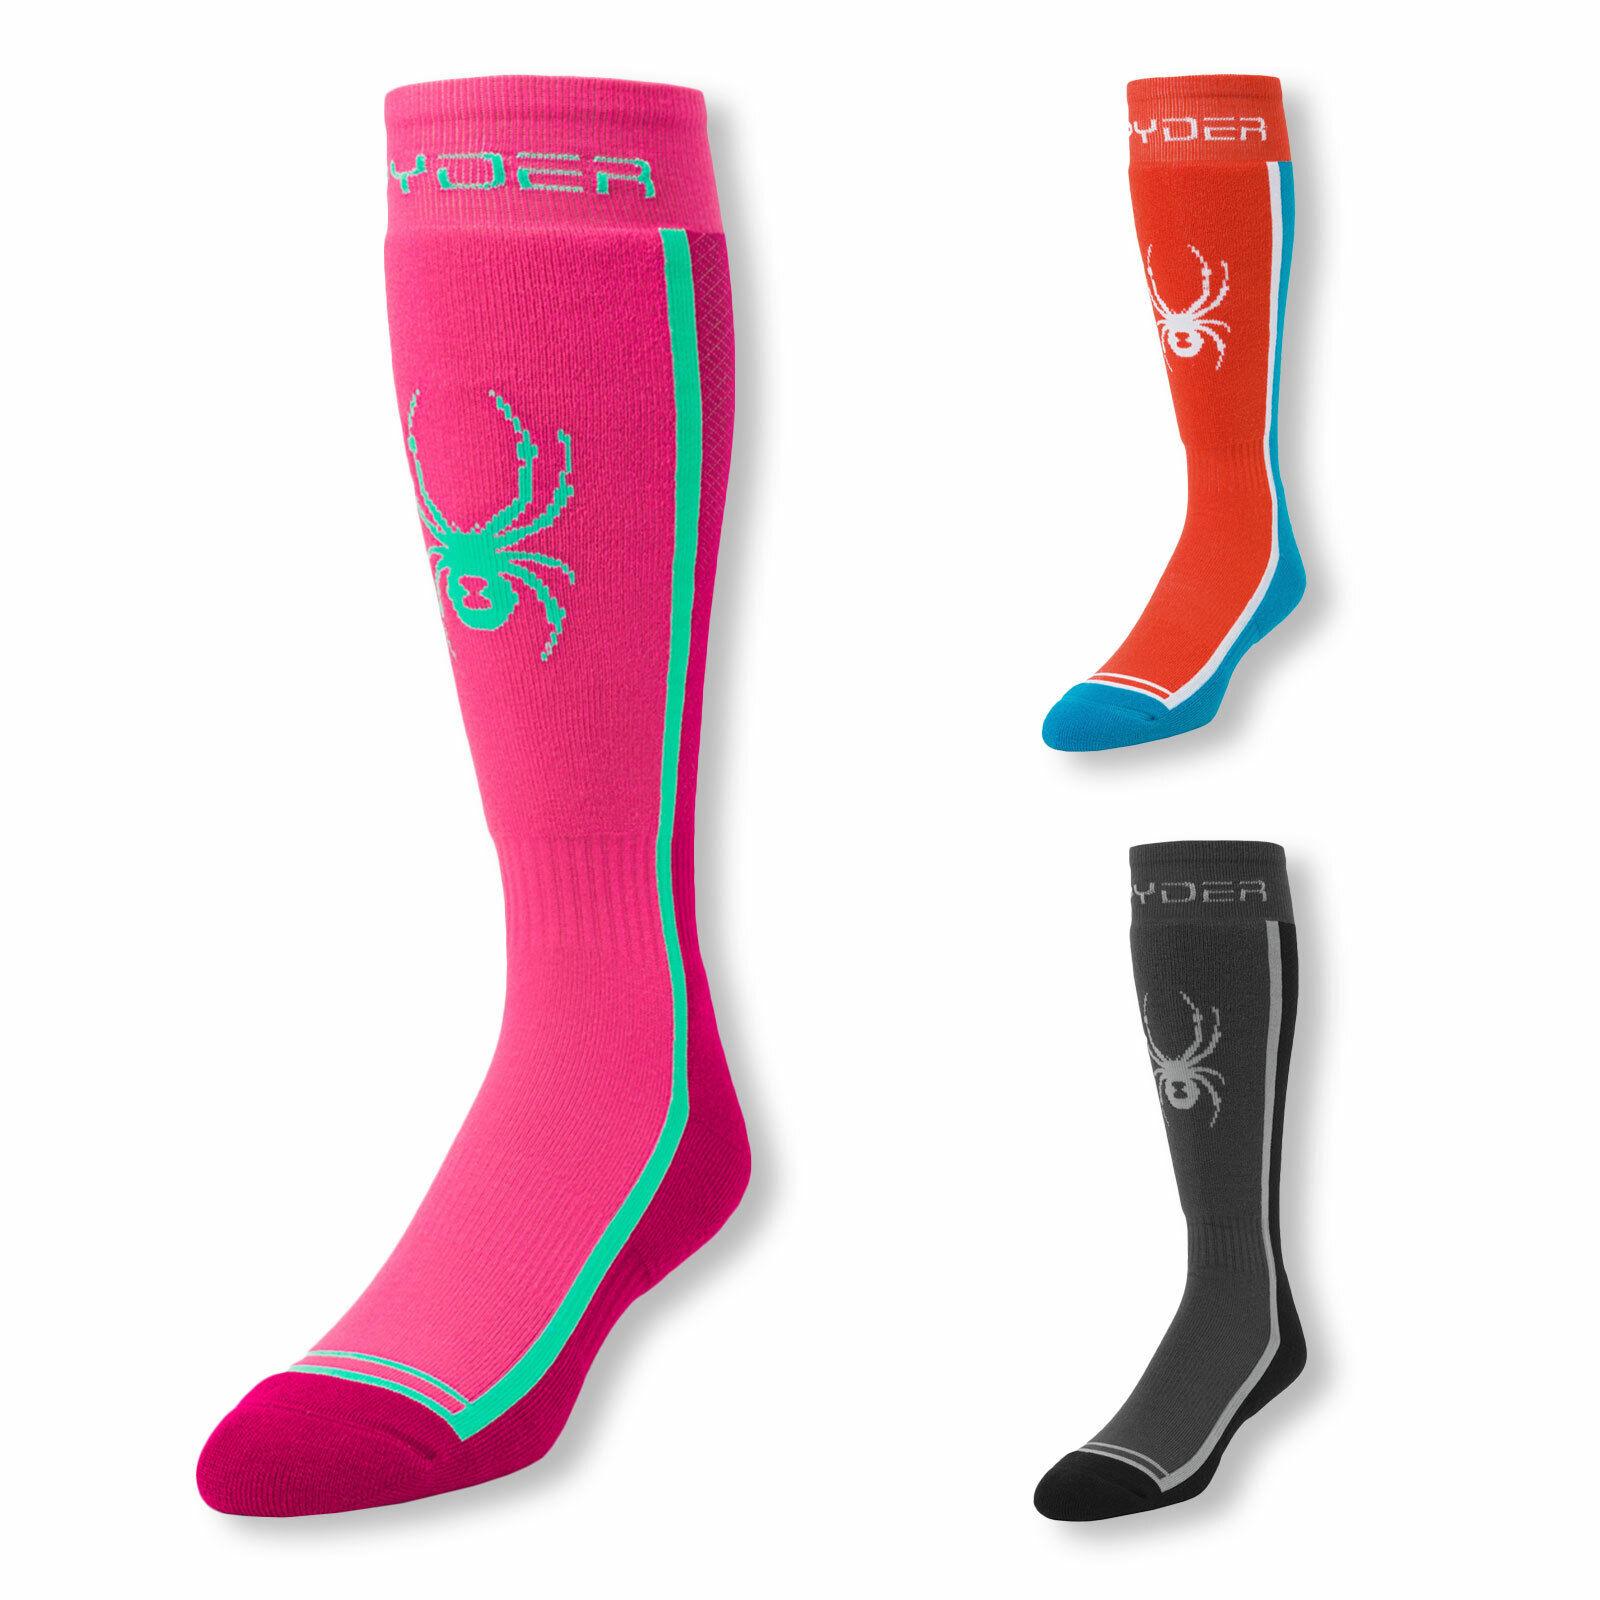 Spyder Damen Skisocken Skistrümpfe Sportsocken Sweep Socks Farbwahl